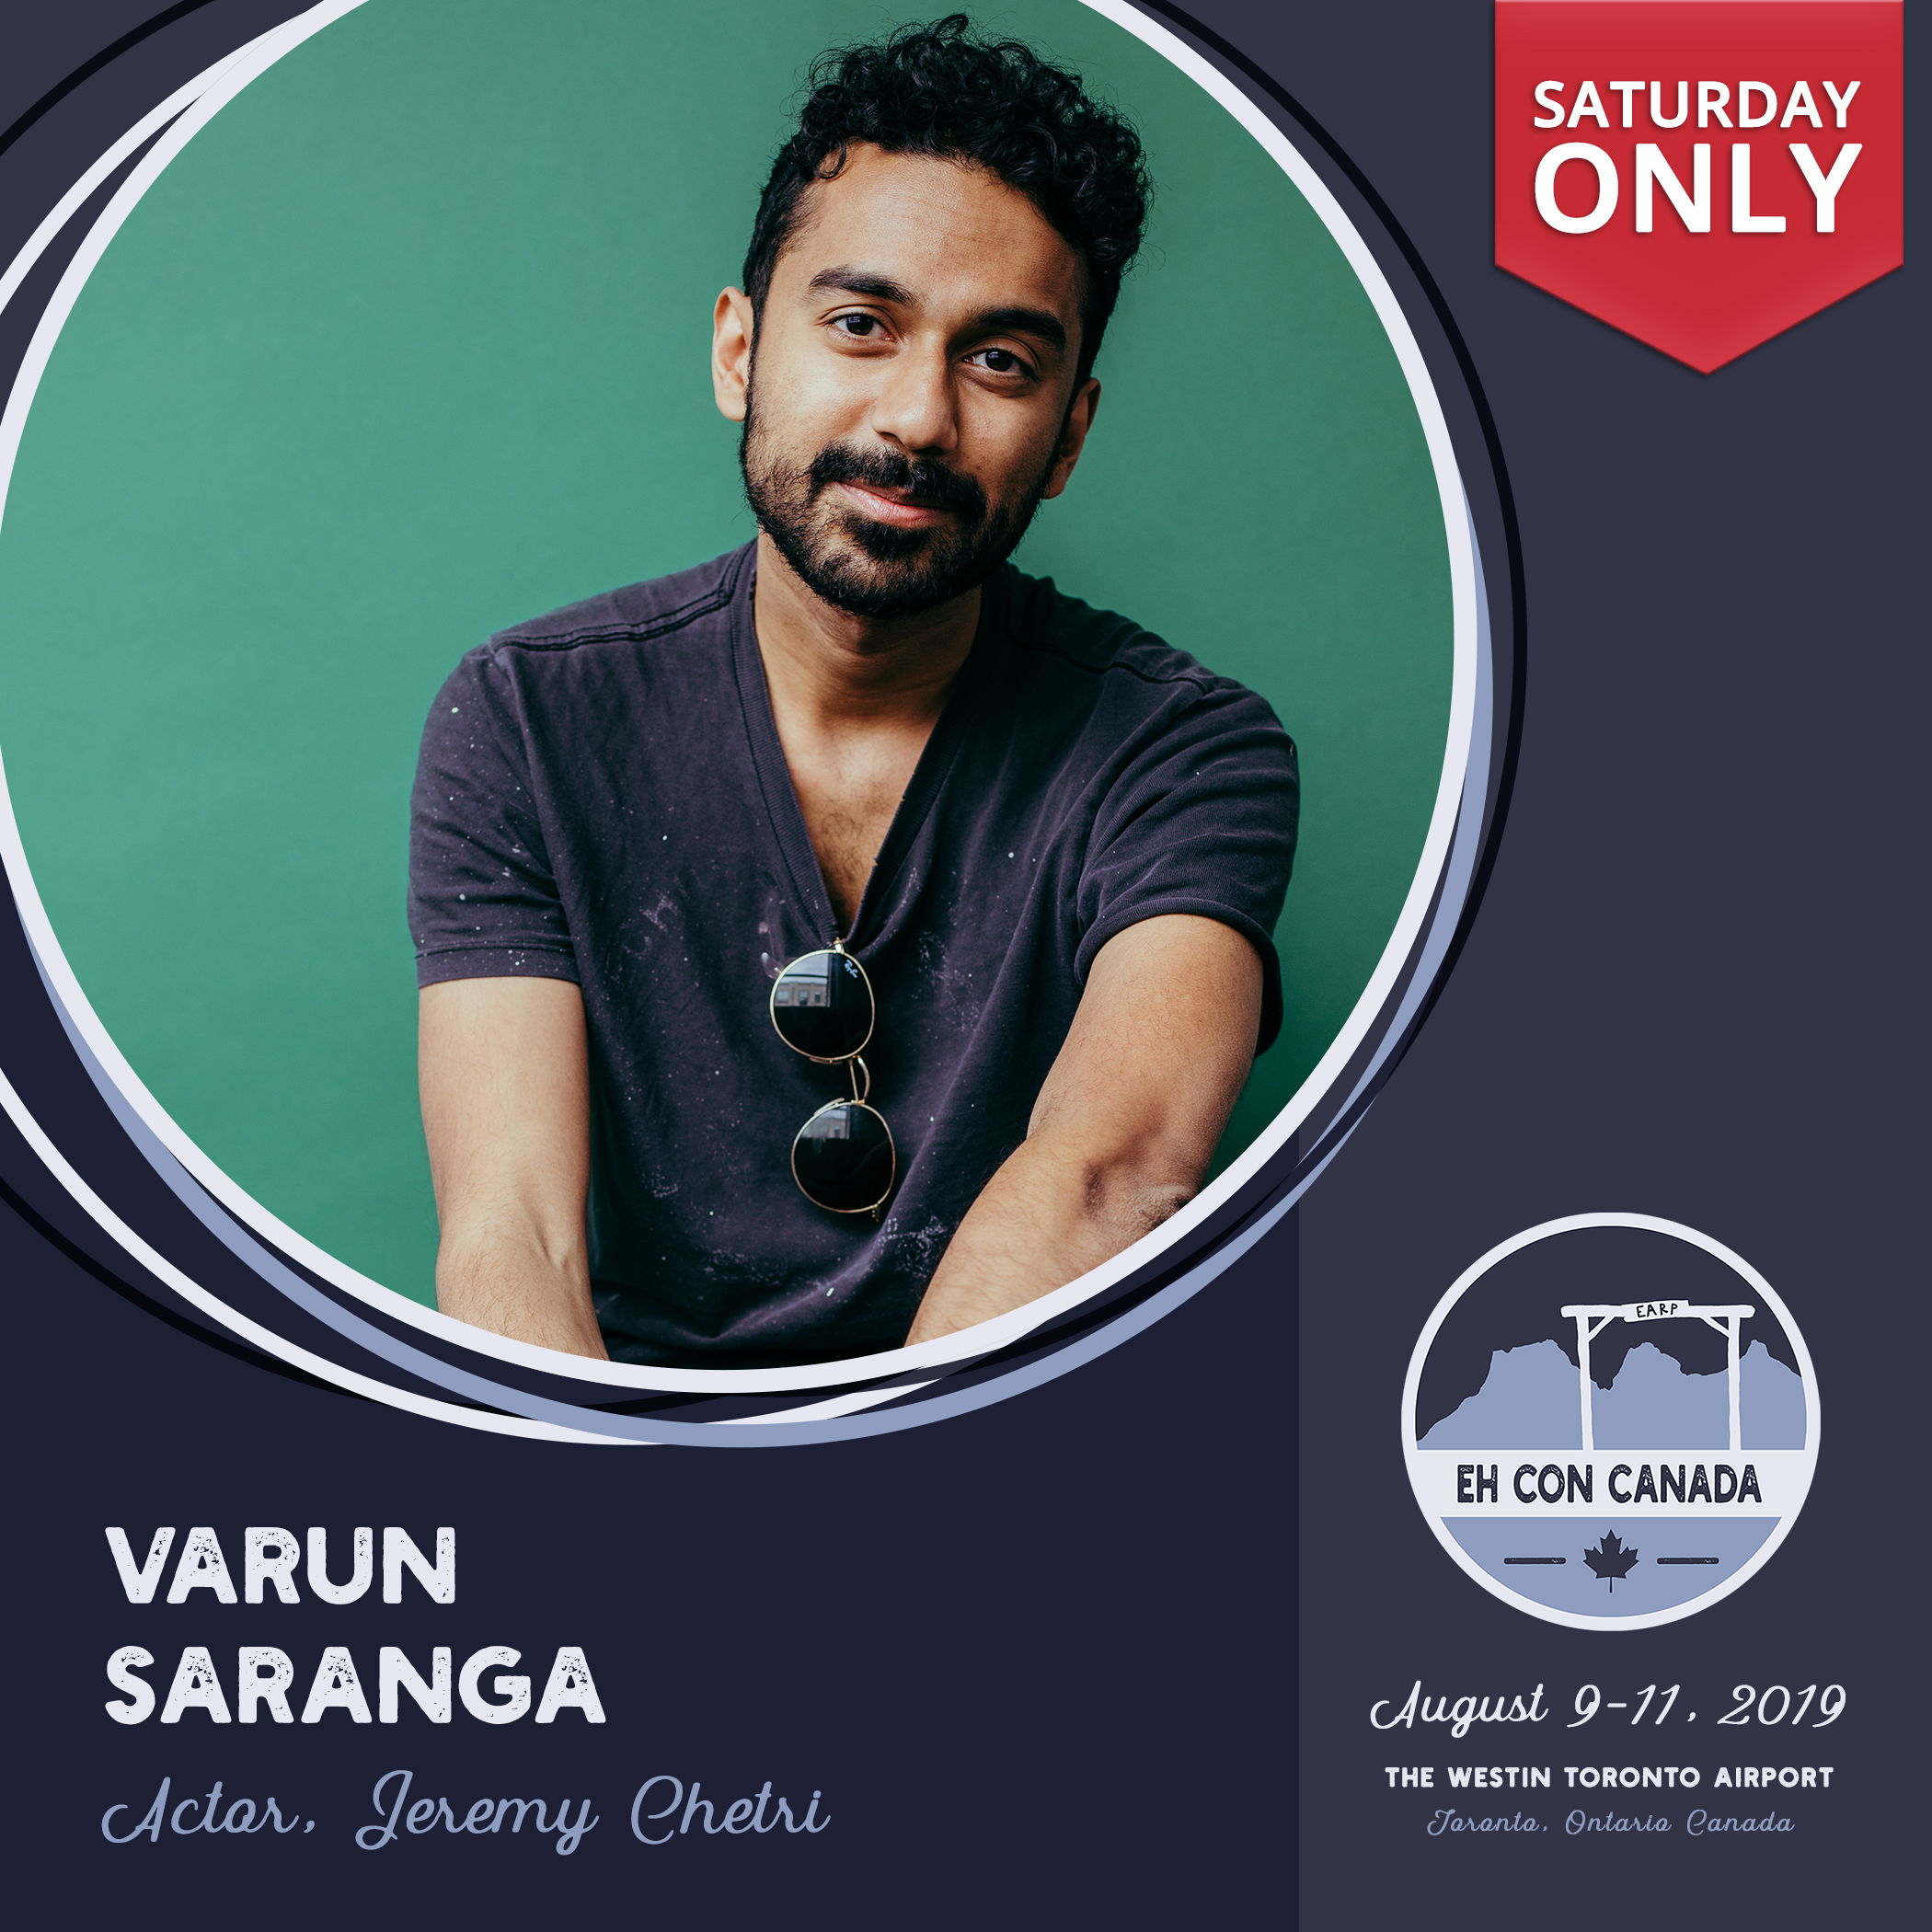 Varun's Bio